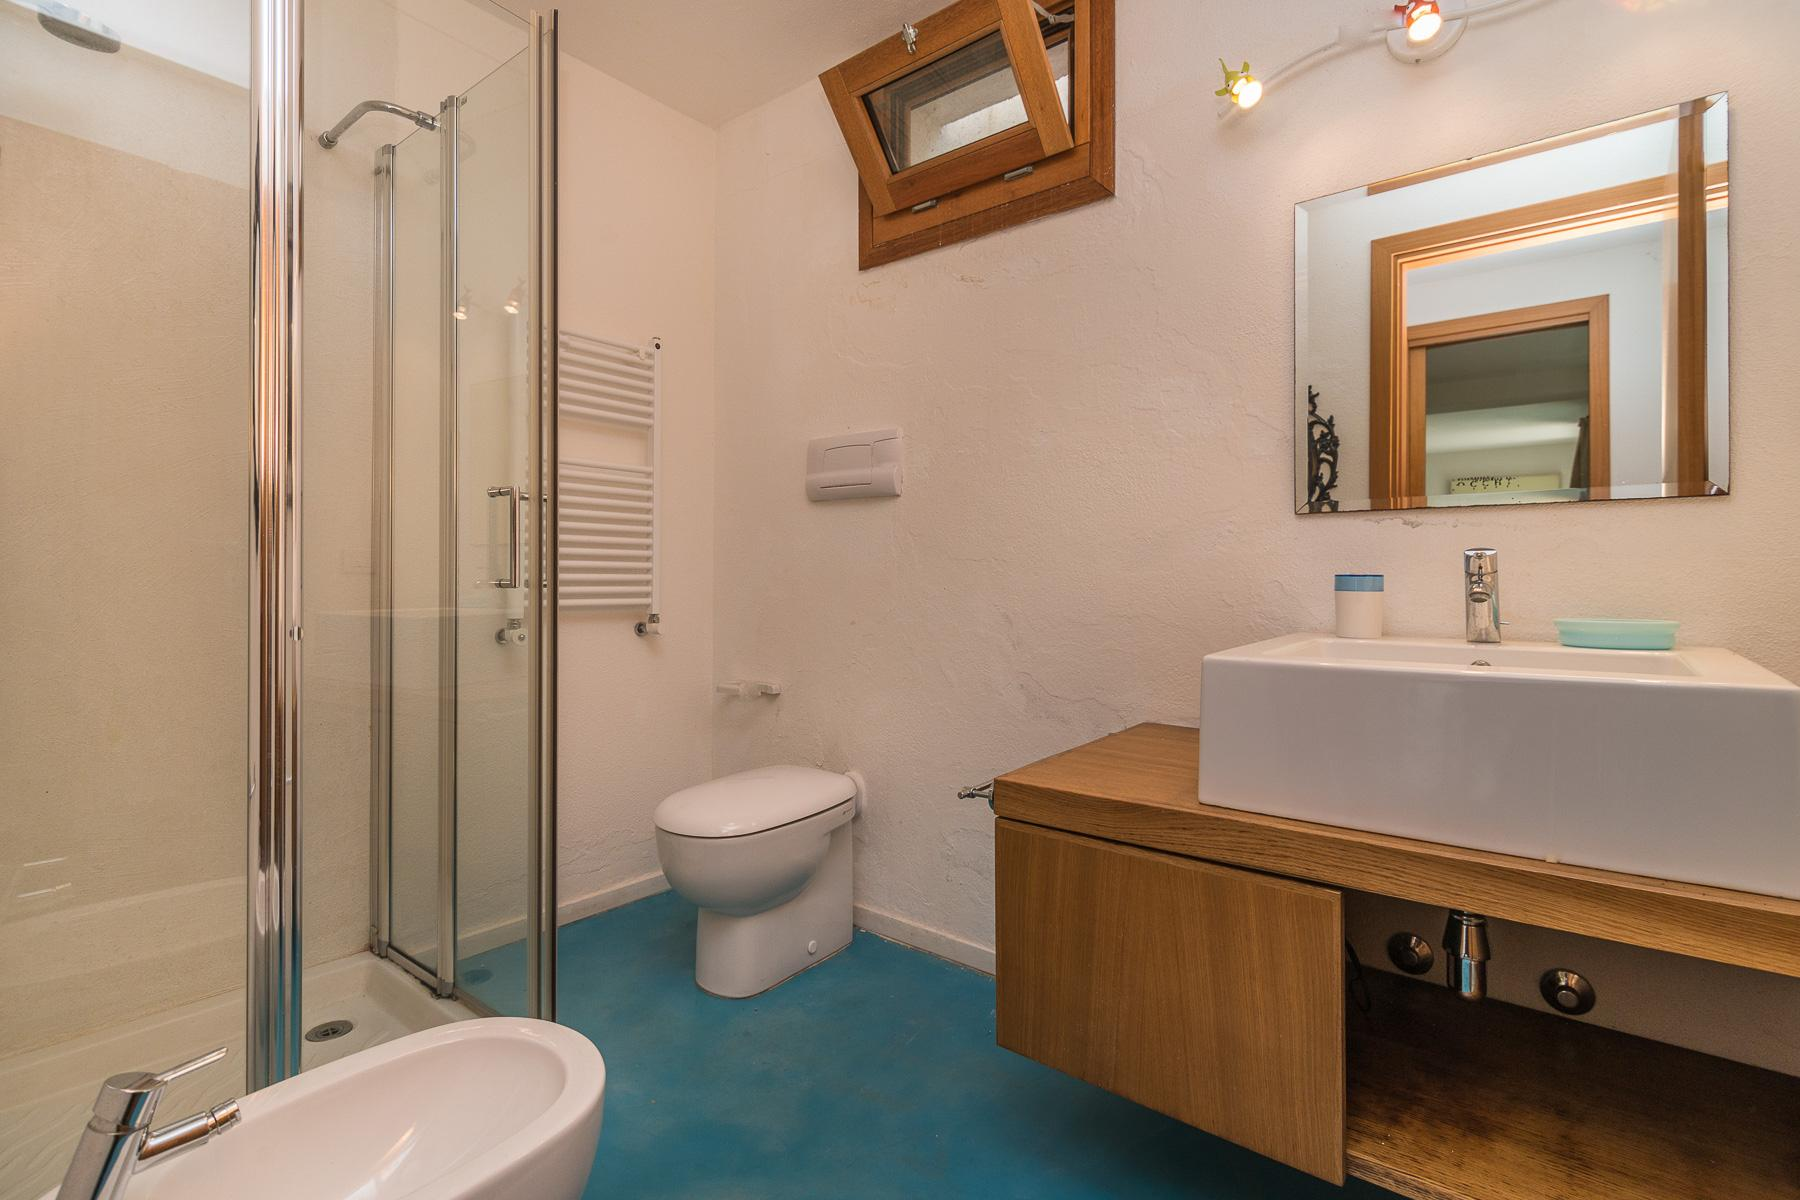 Golfo Aranci Sos Aranzos Wonderfull Villa with direct access to the beach - 17